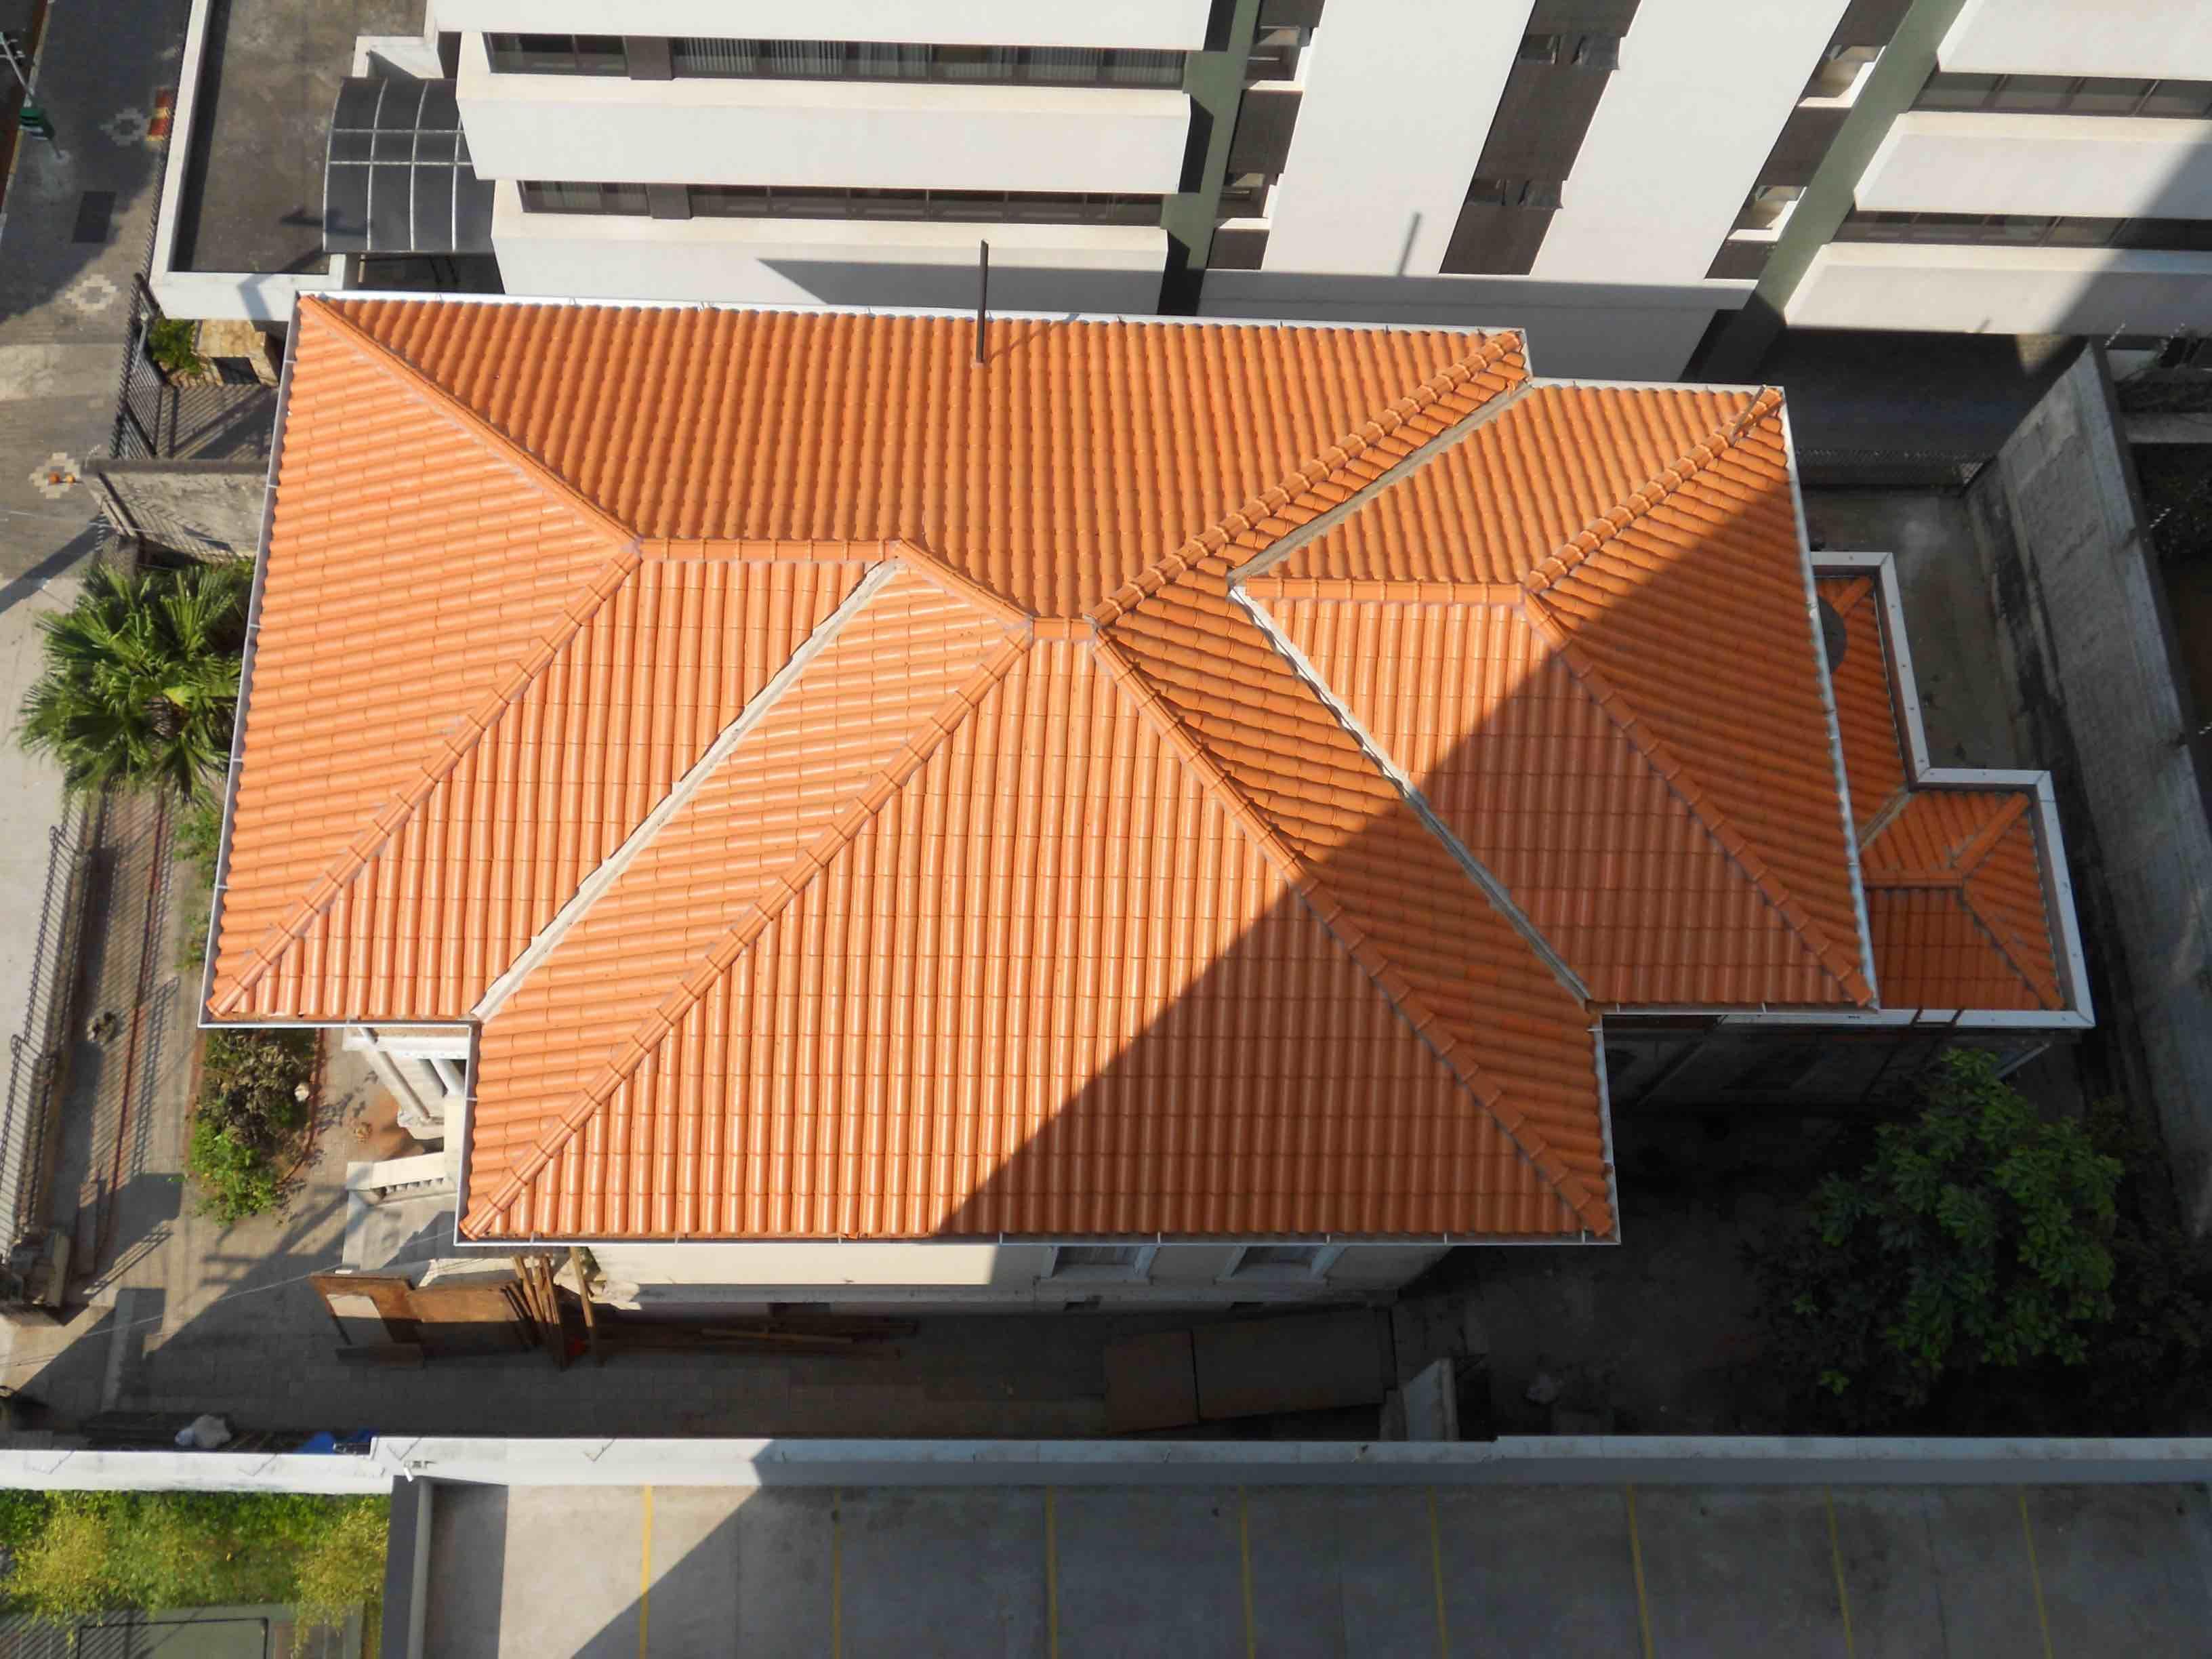 Quatro 225 Guas Arquitetura Telhado Arquitetura